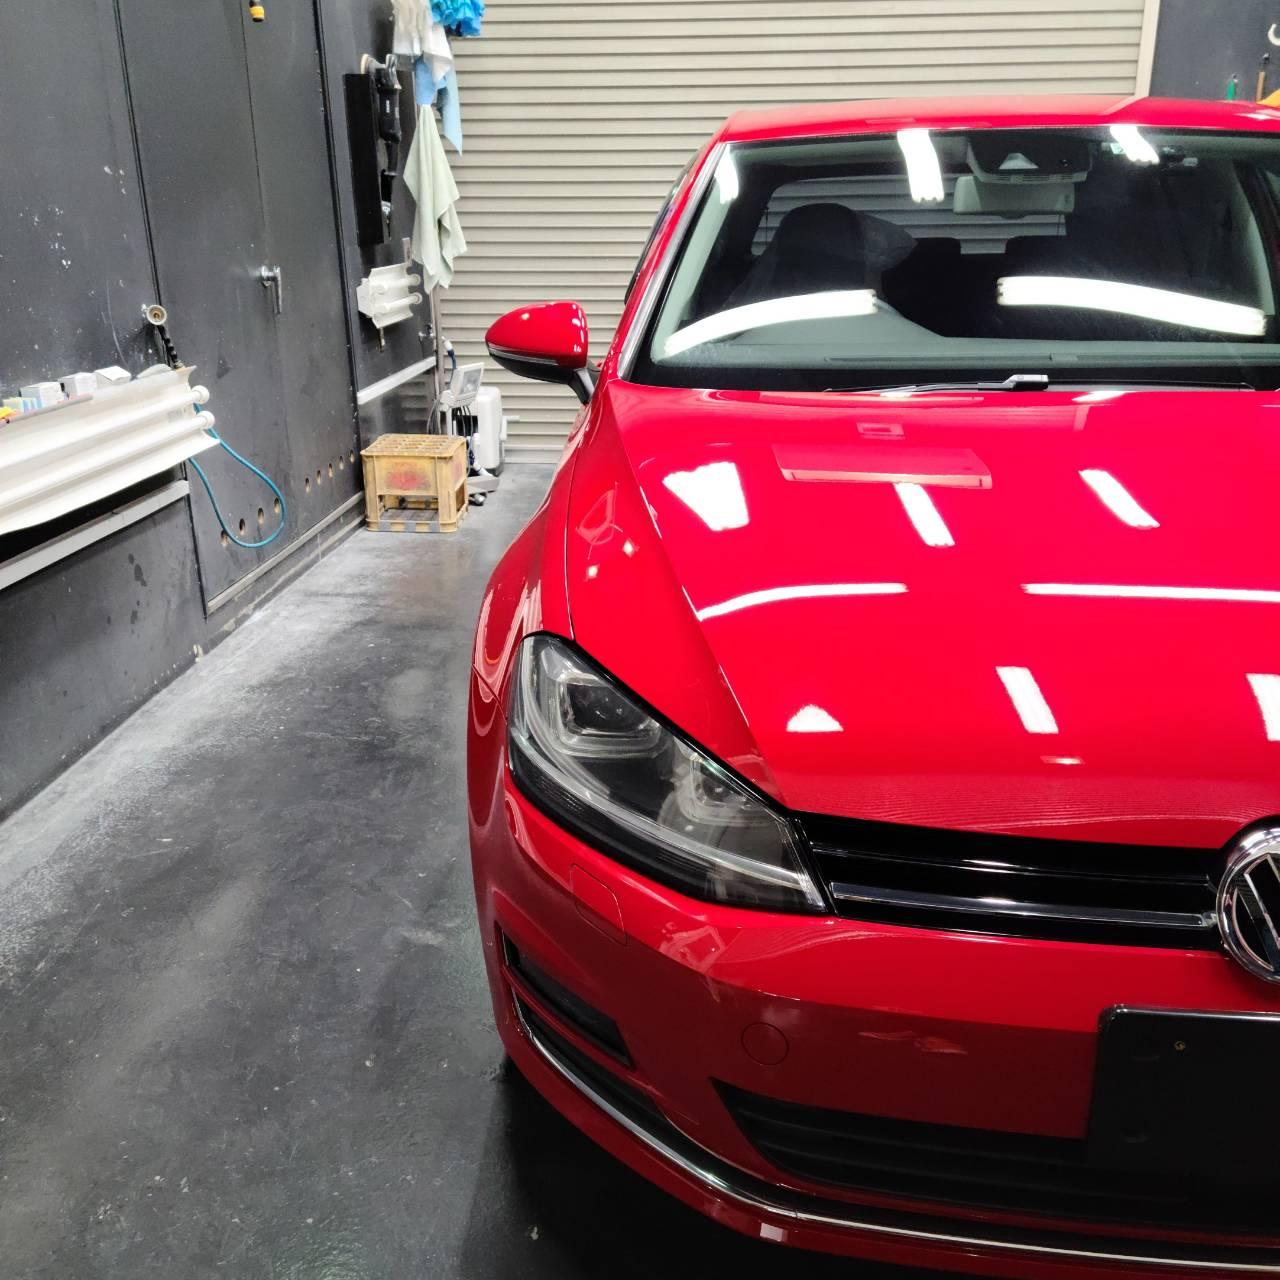 Volkswagenゴルフ 磨き&コーティング